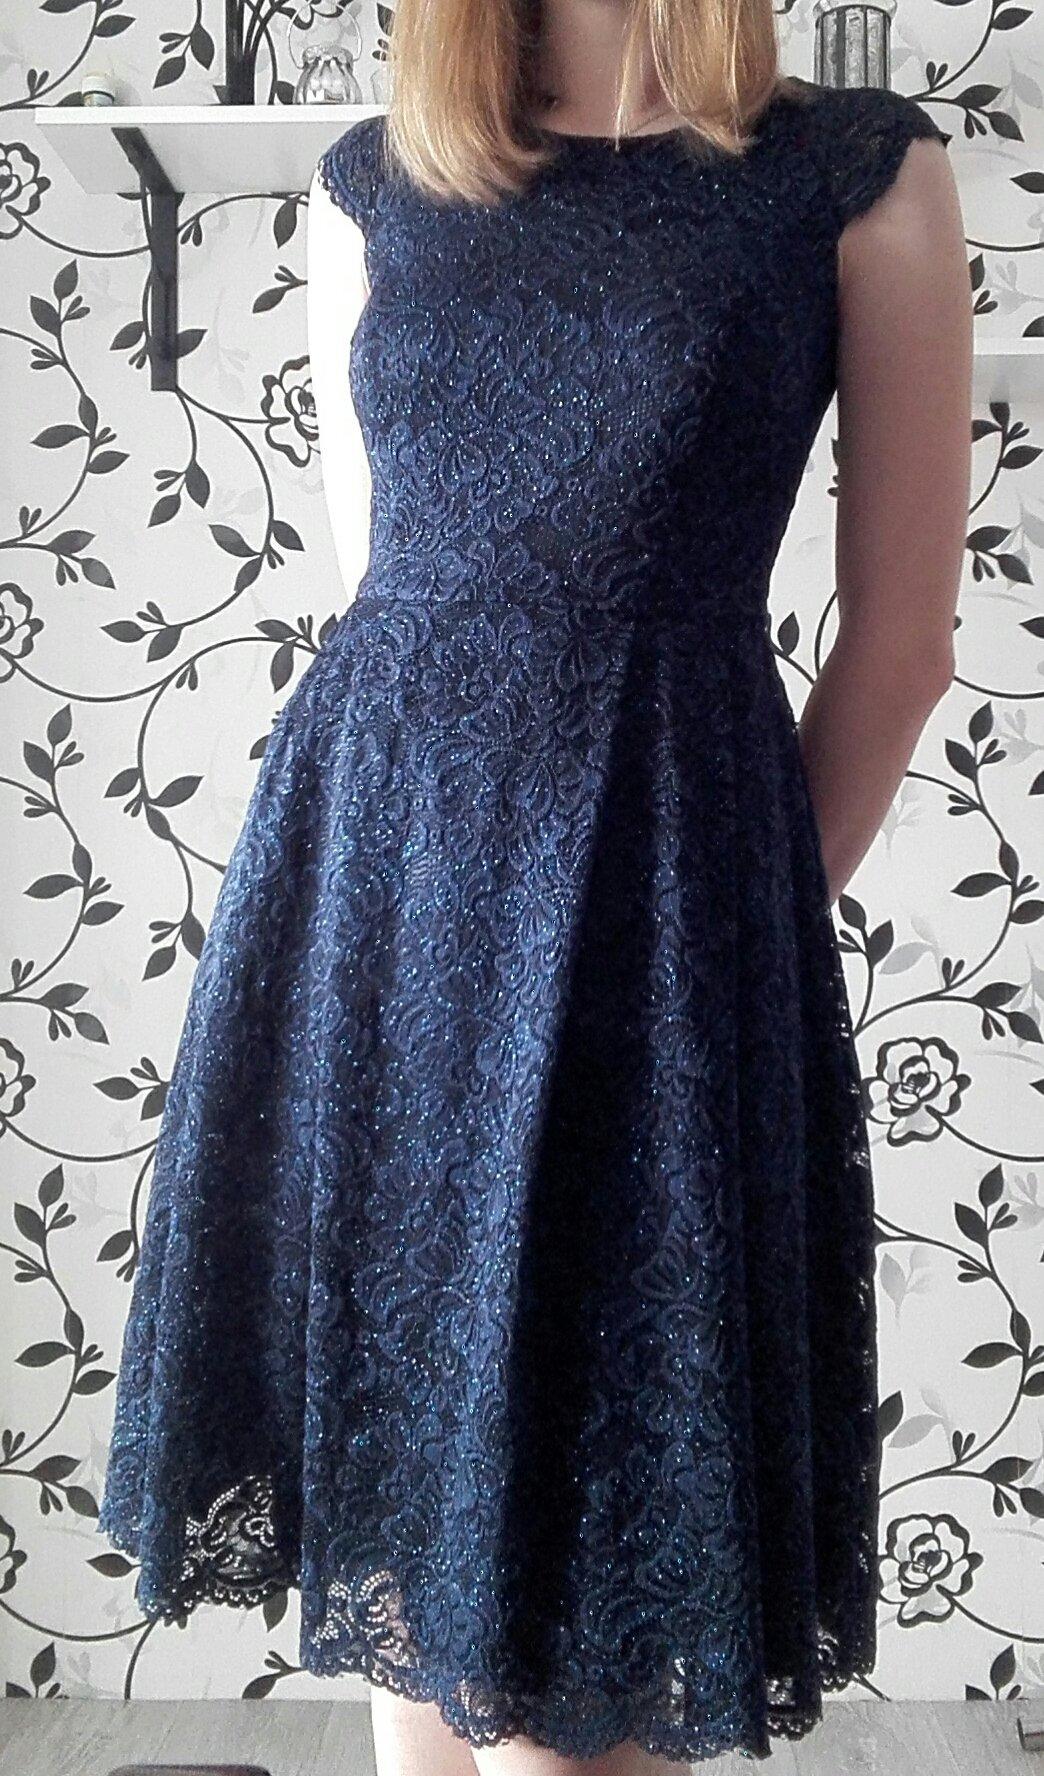 704fae6405 Sukienka damska elegancka wieczorowa DE FACTO - 7207417329 ...